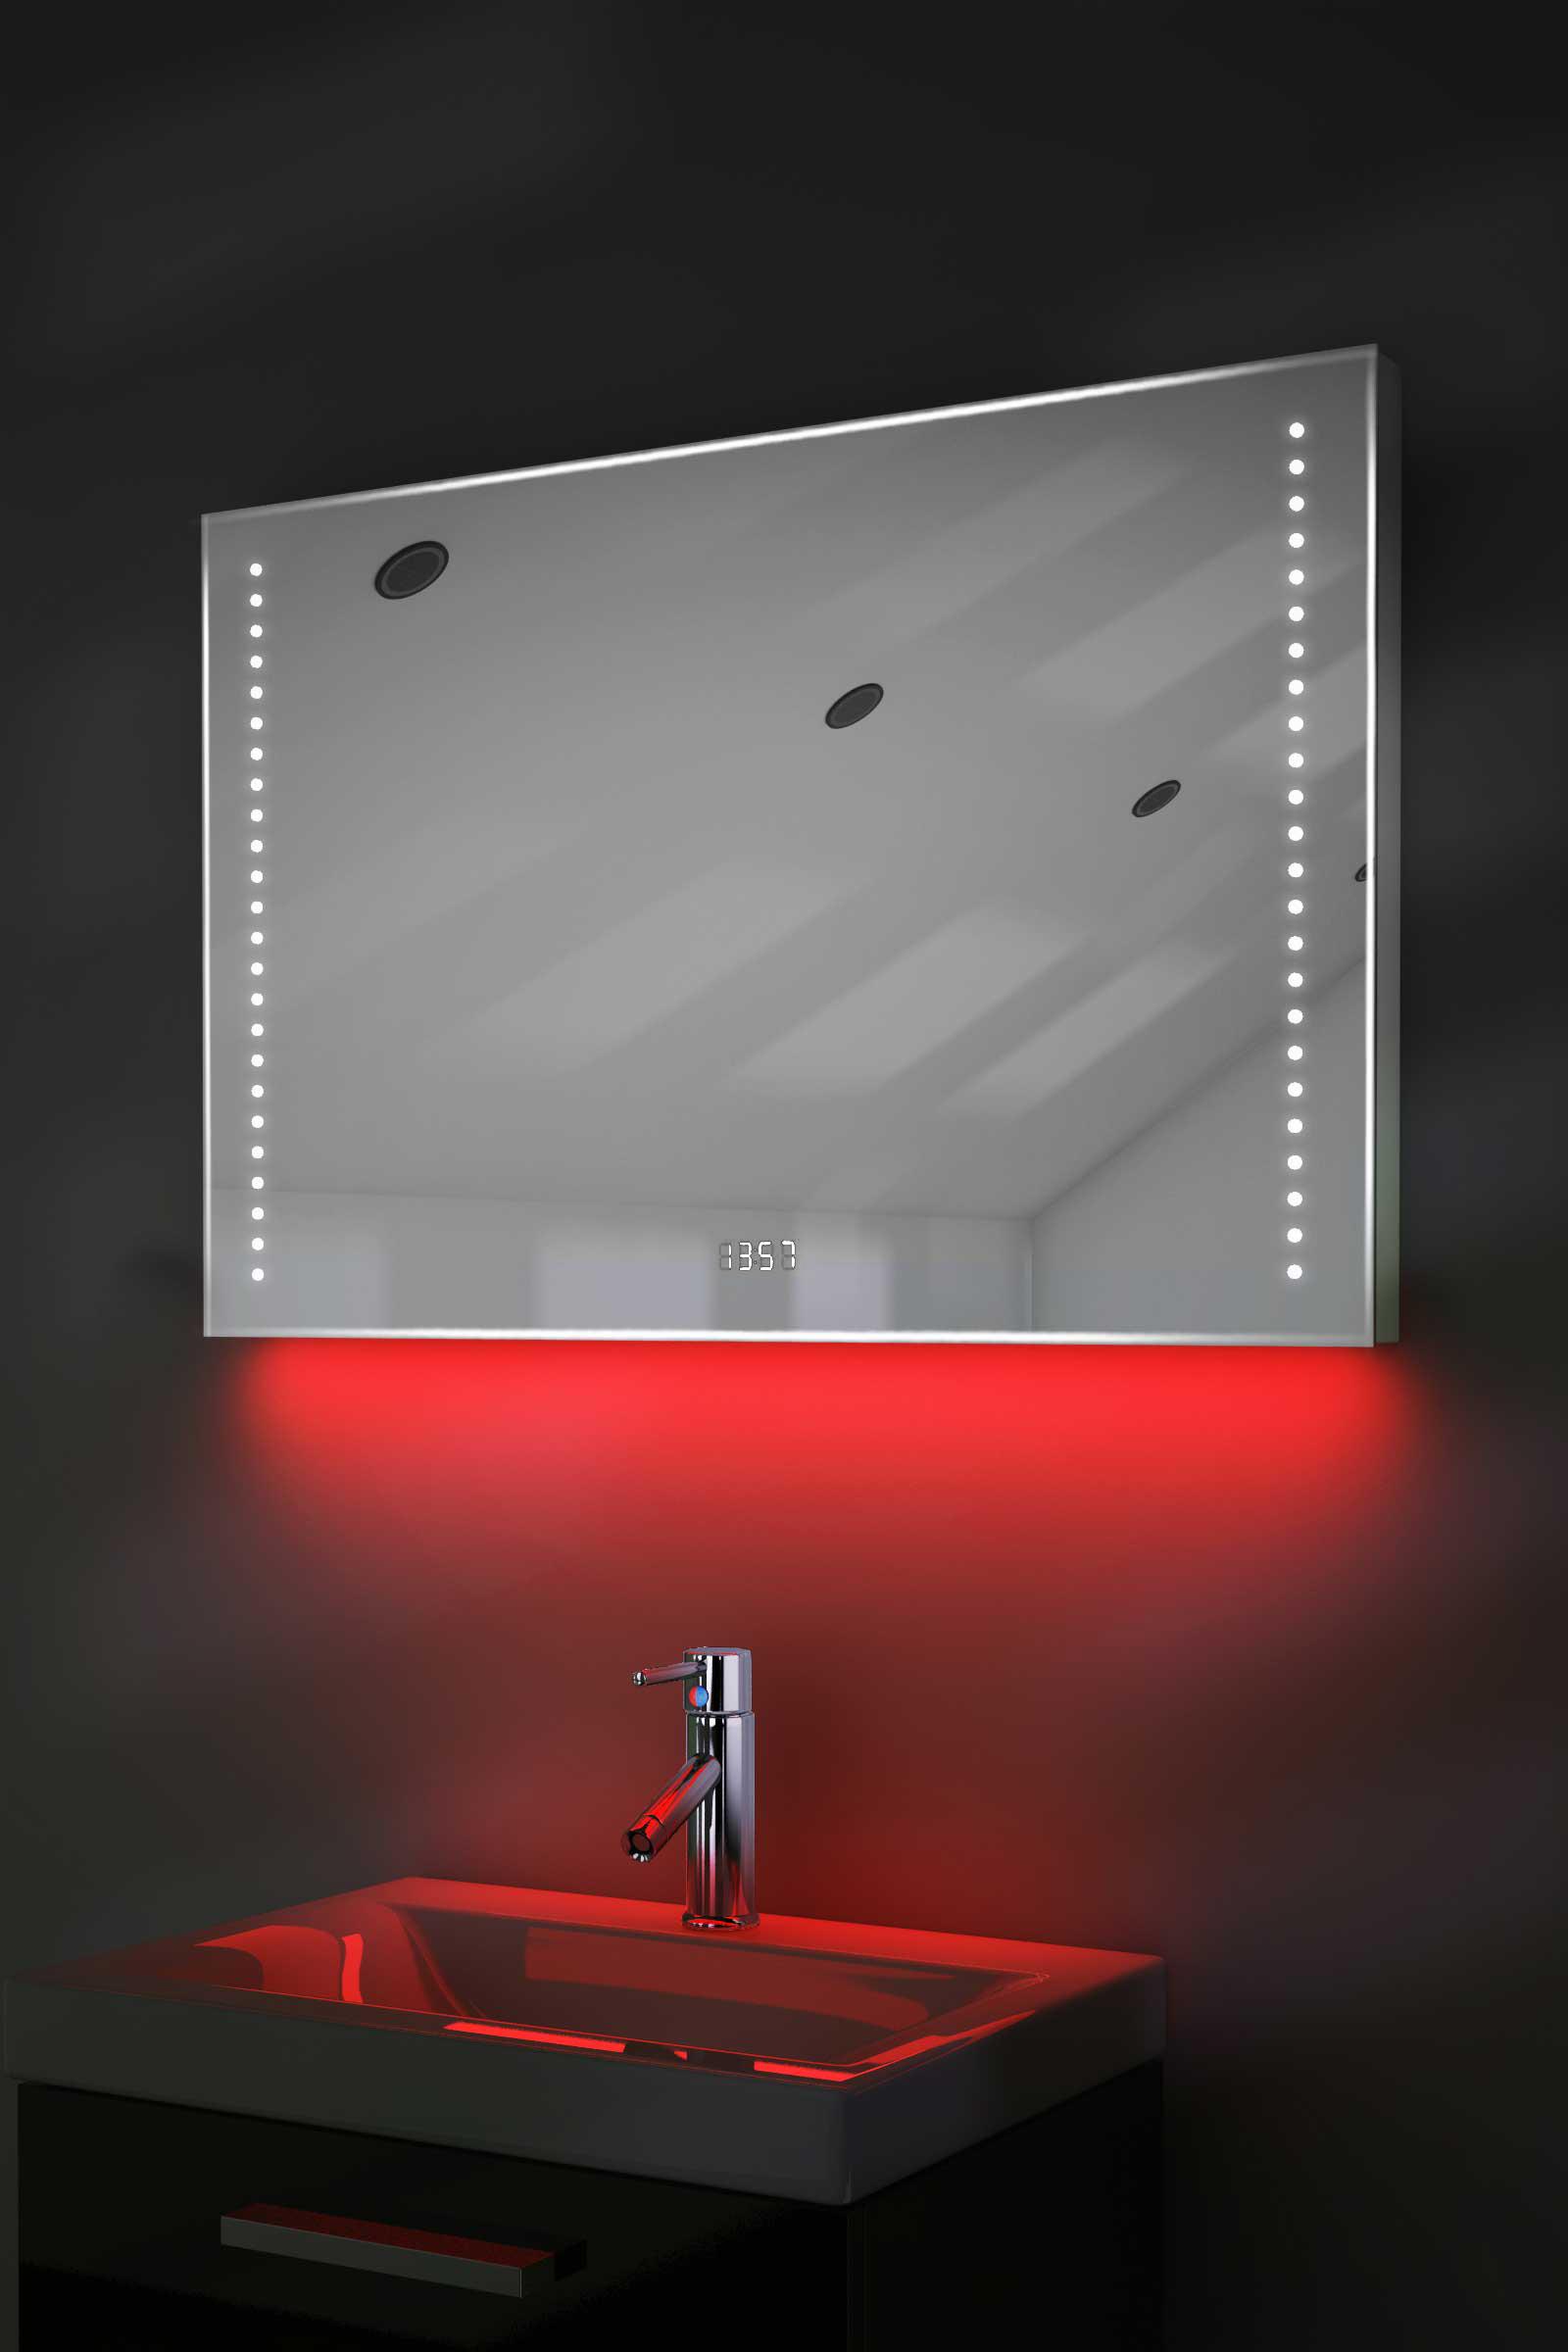 Digital Clock Shaver Bathroom Mirror With Under Lighting Demist Sensor K195 Ebay